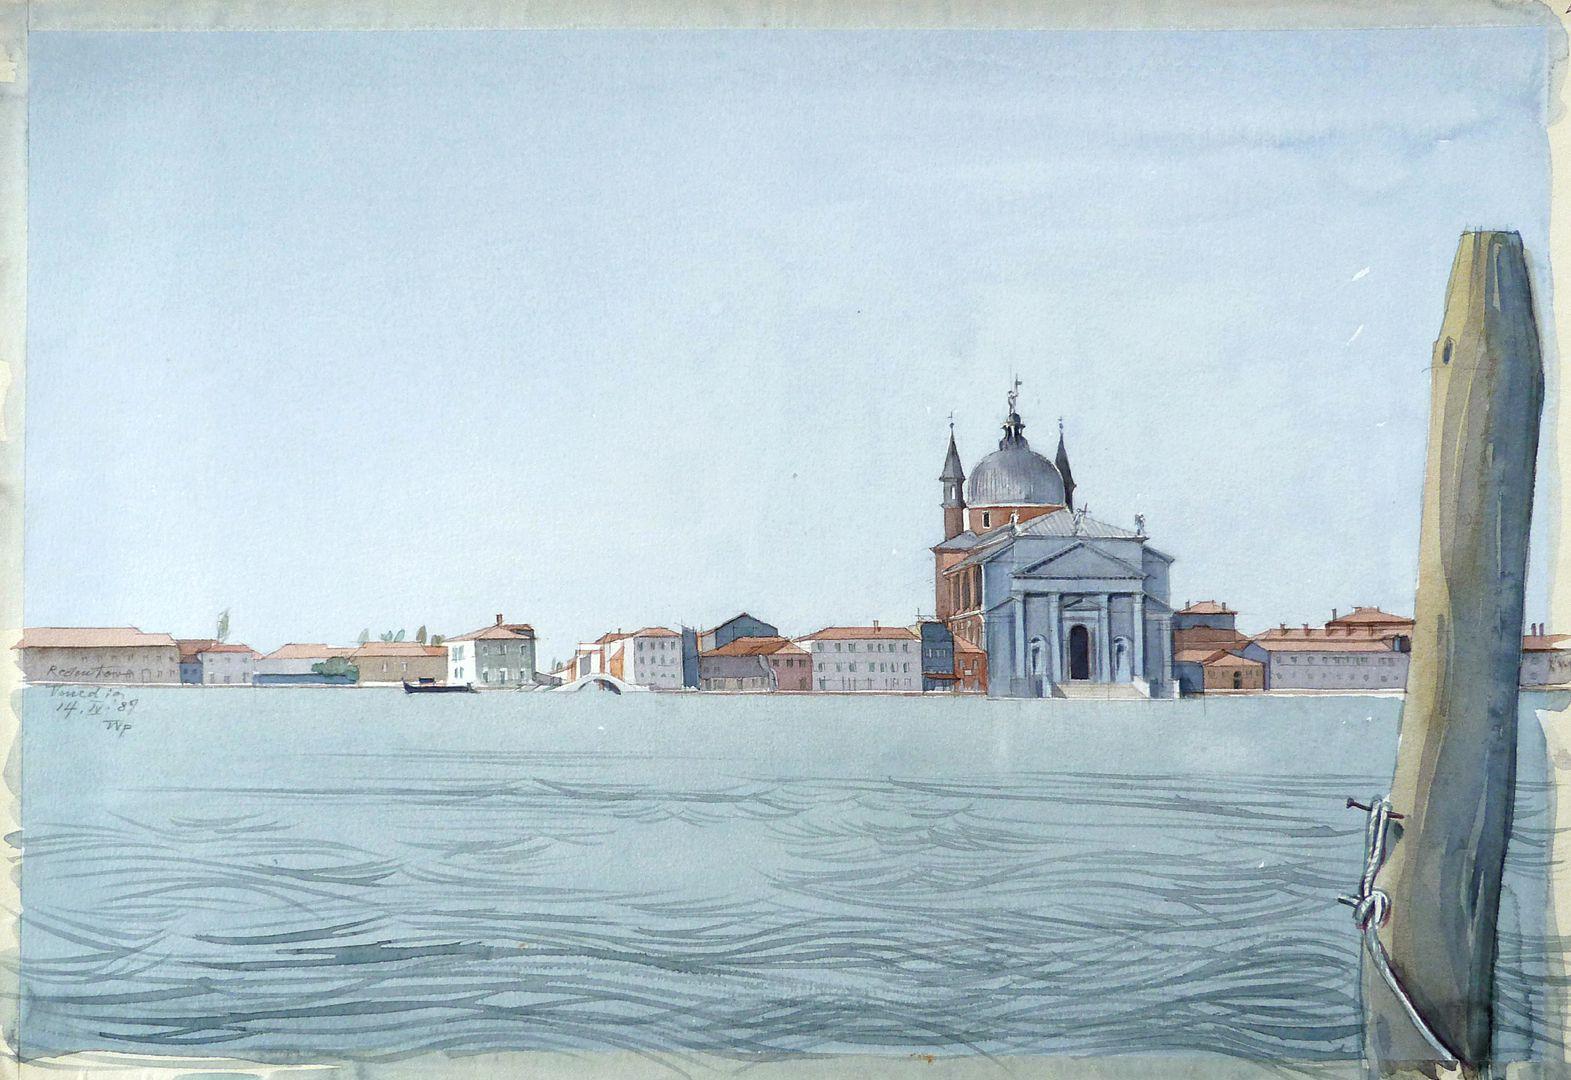 Il Redentore (Venice) Total view